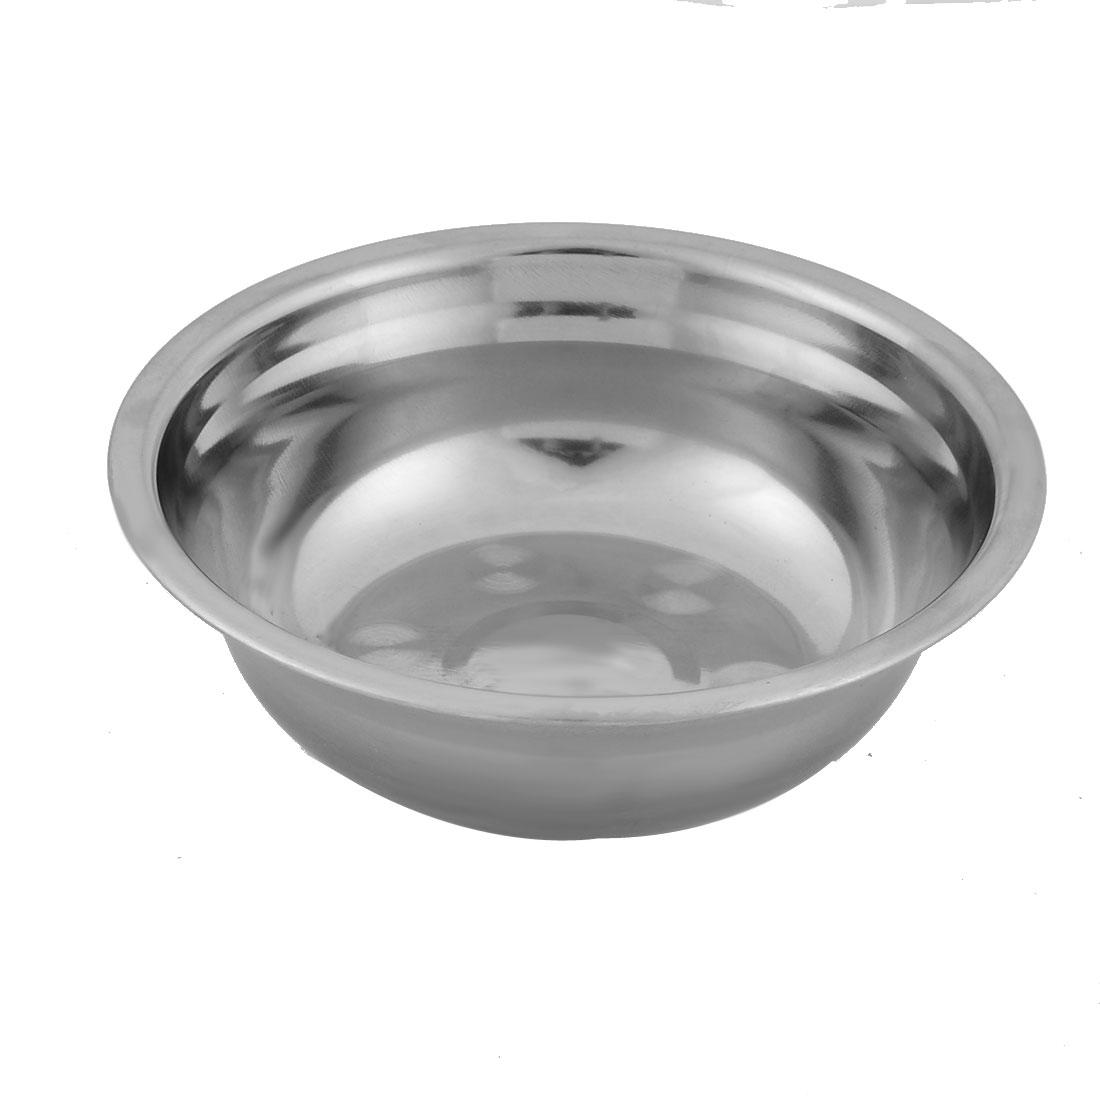 Household Kitchen Stainless Steel Fruit Soup Rice Dinner Bowl 13cm Diameter Silver Tone